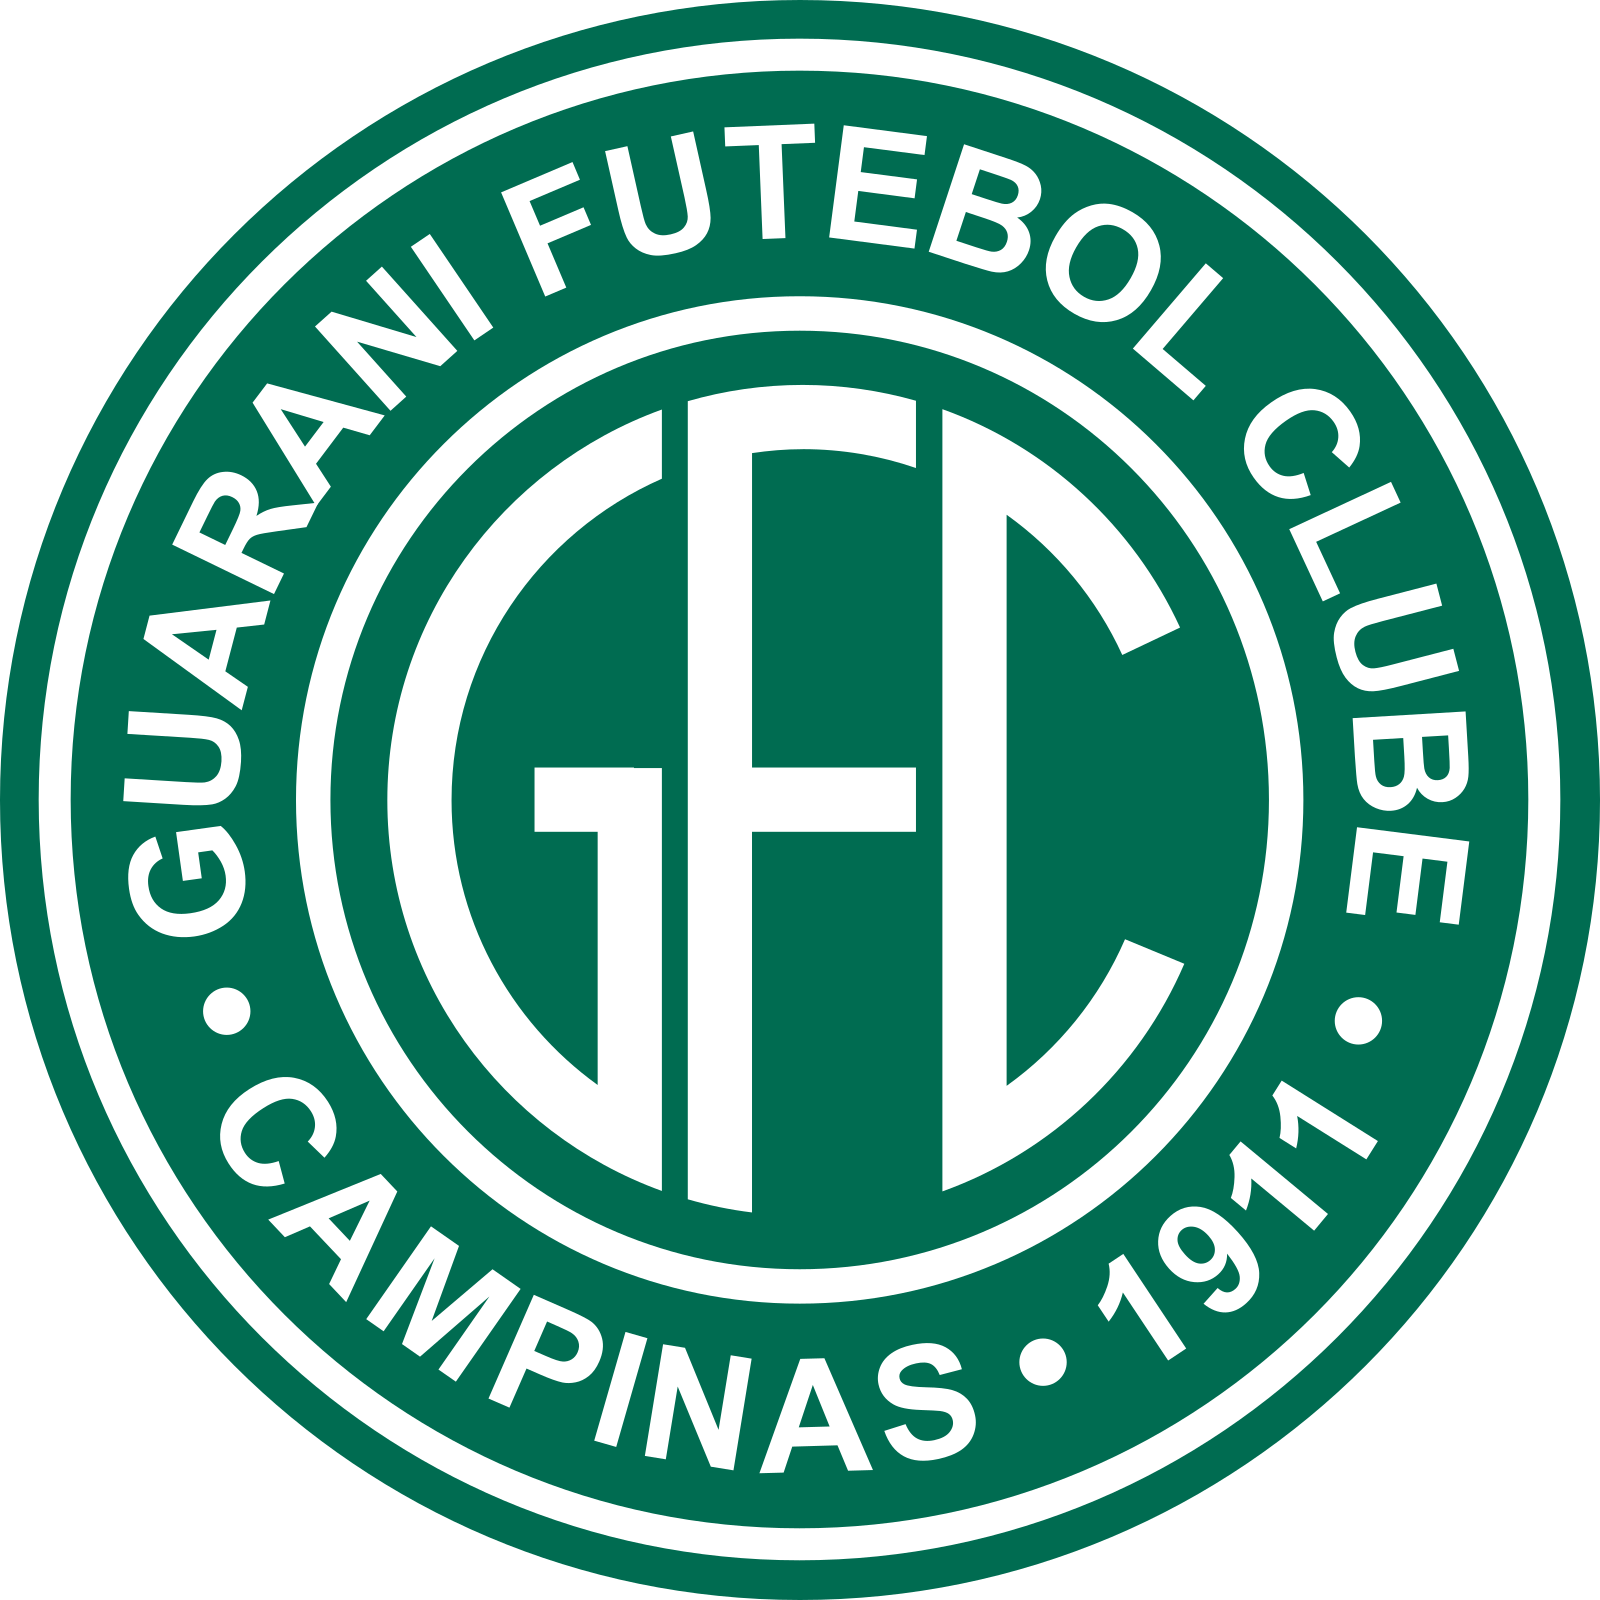 Guarani fc logo esudo 5 - Guarani FC Logo - Brasil